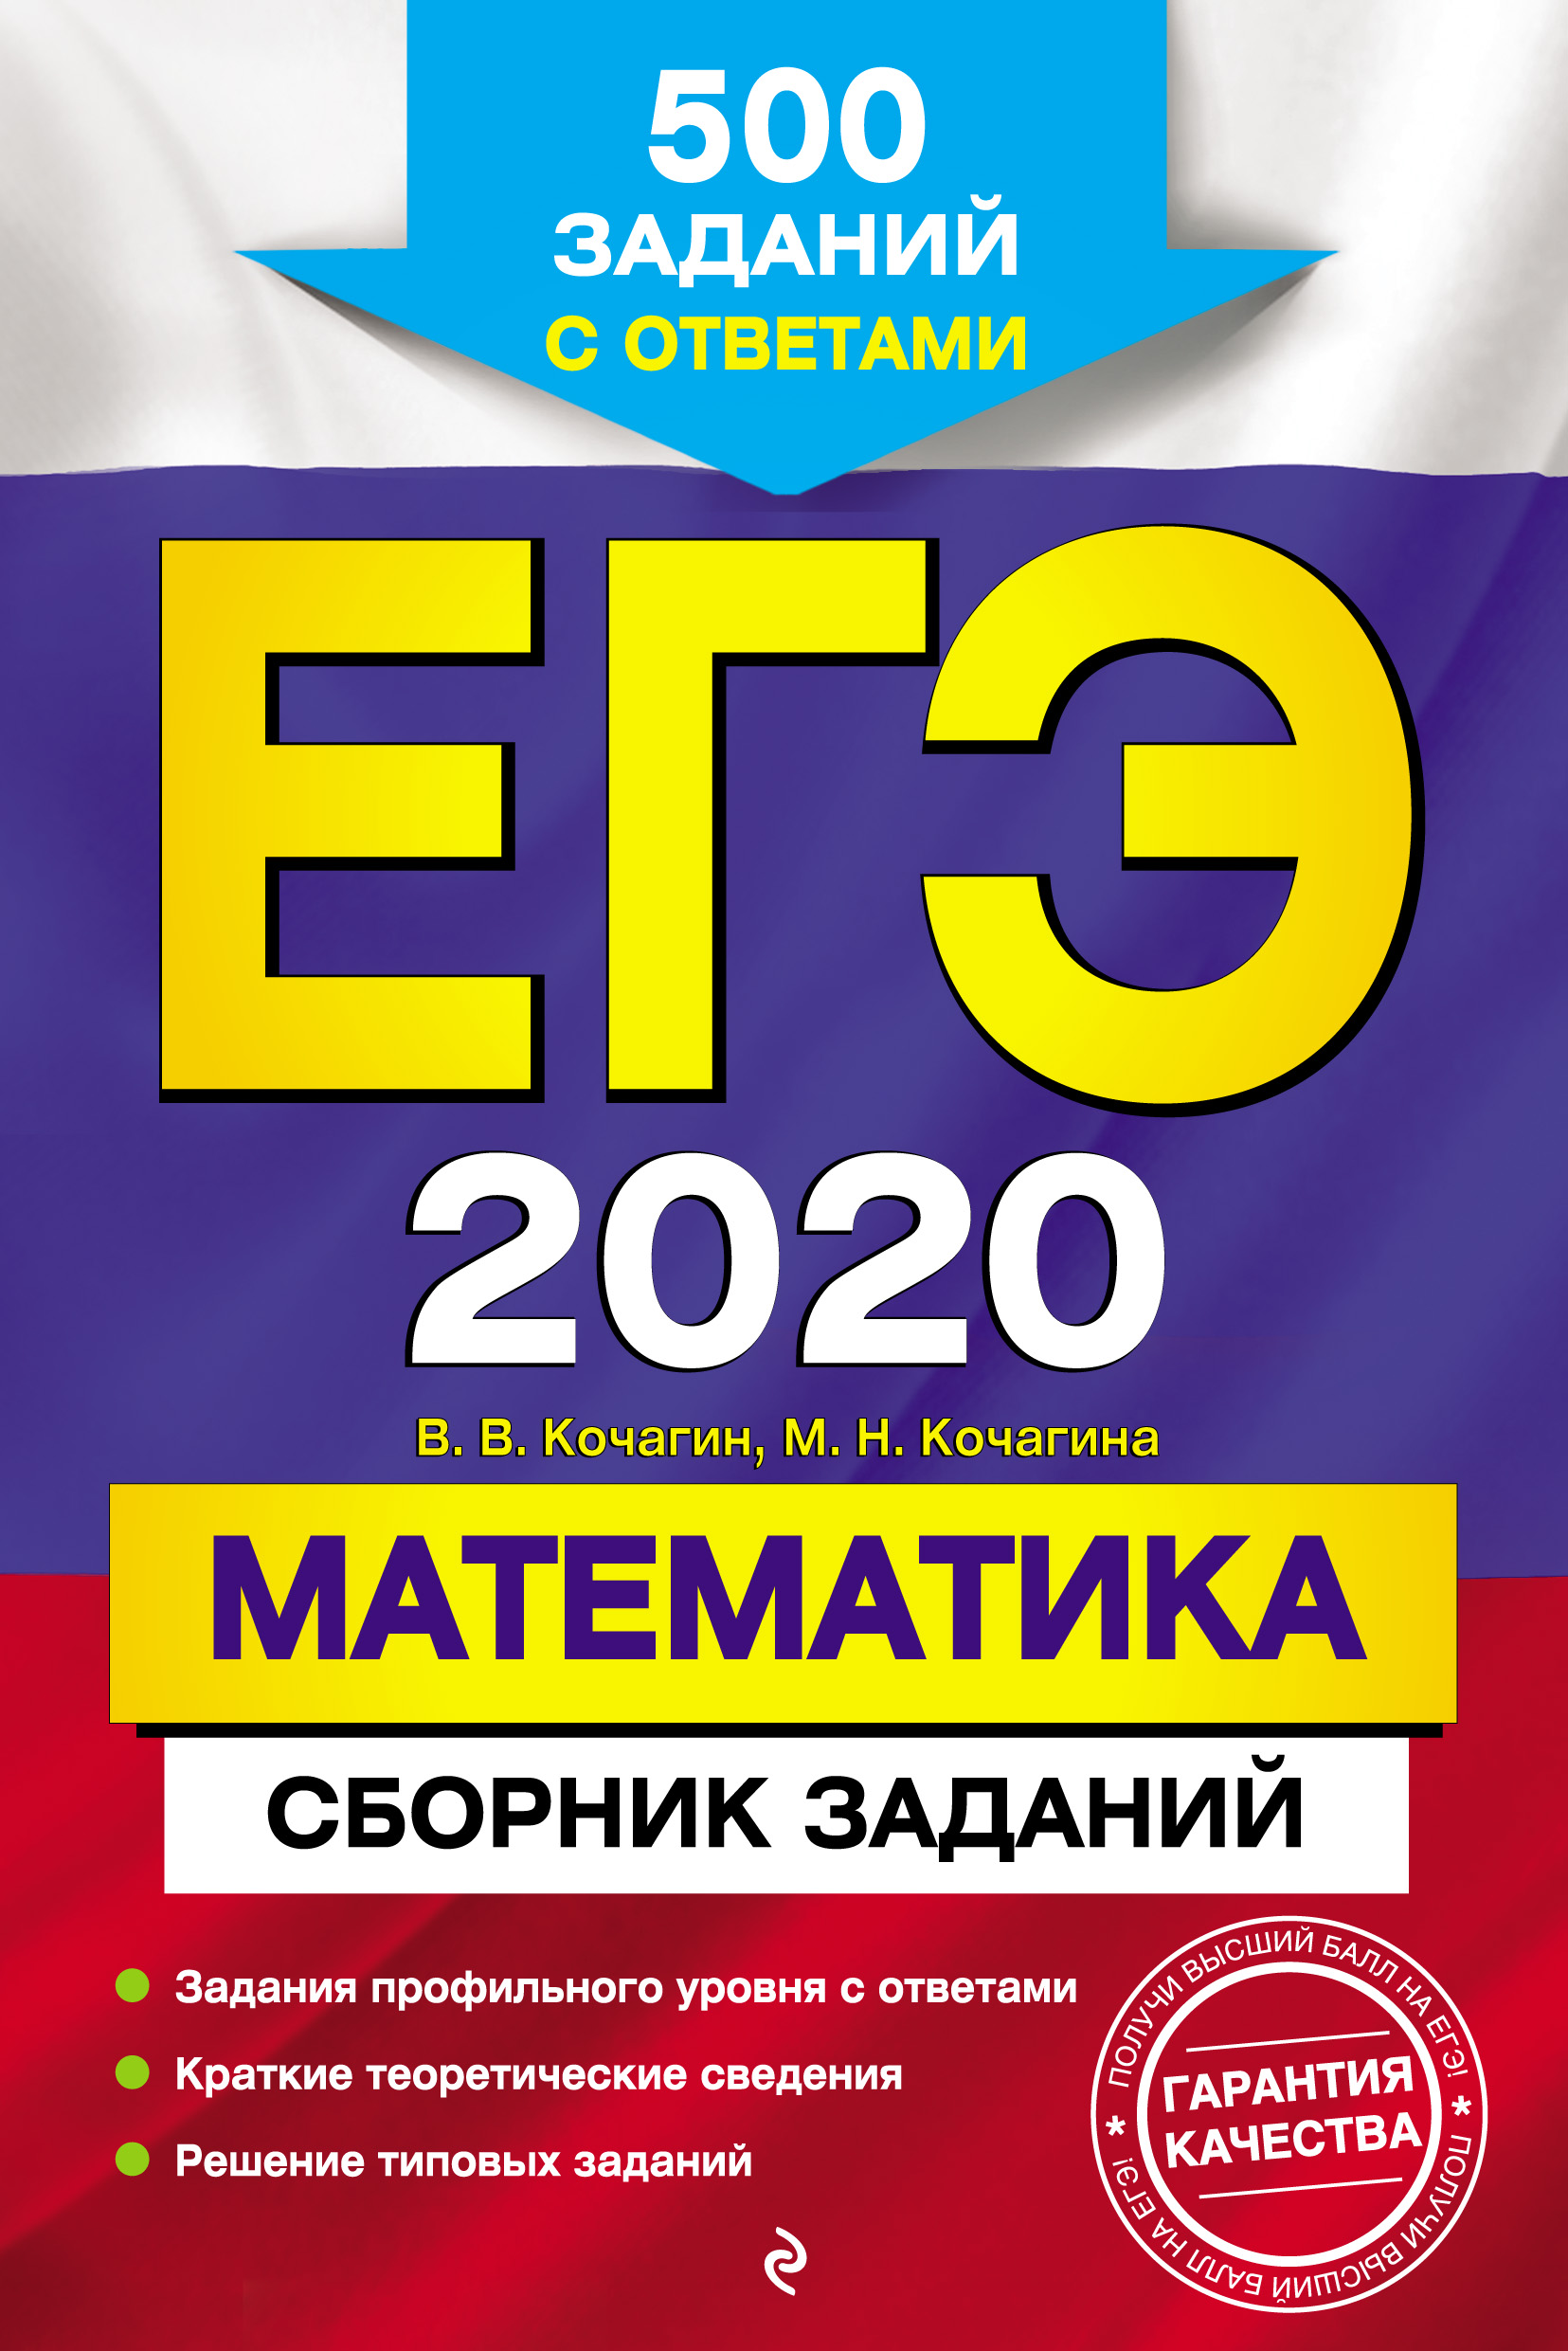 цена на М. Н. Кочагина ЕГЭ-2020. Математика. Сборник заданий. 500 заданий с ответами